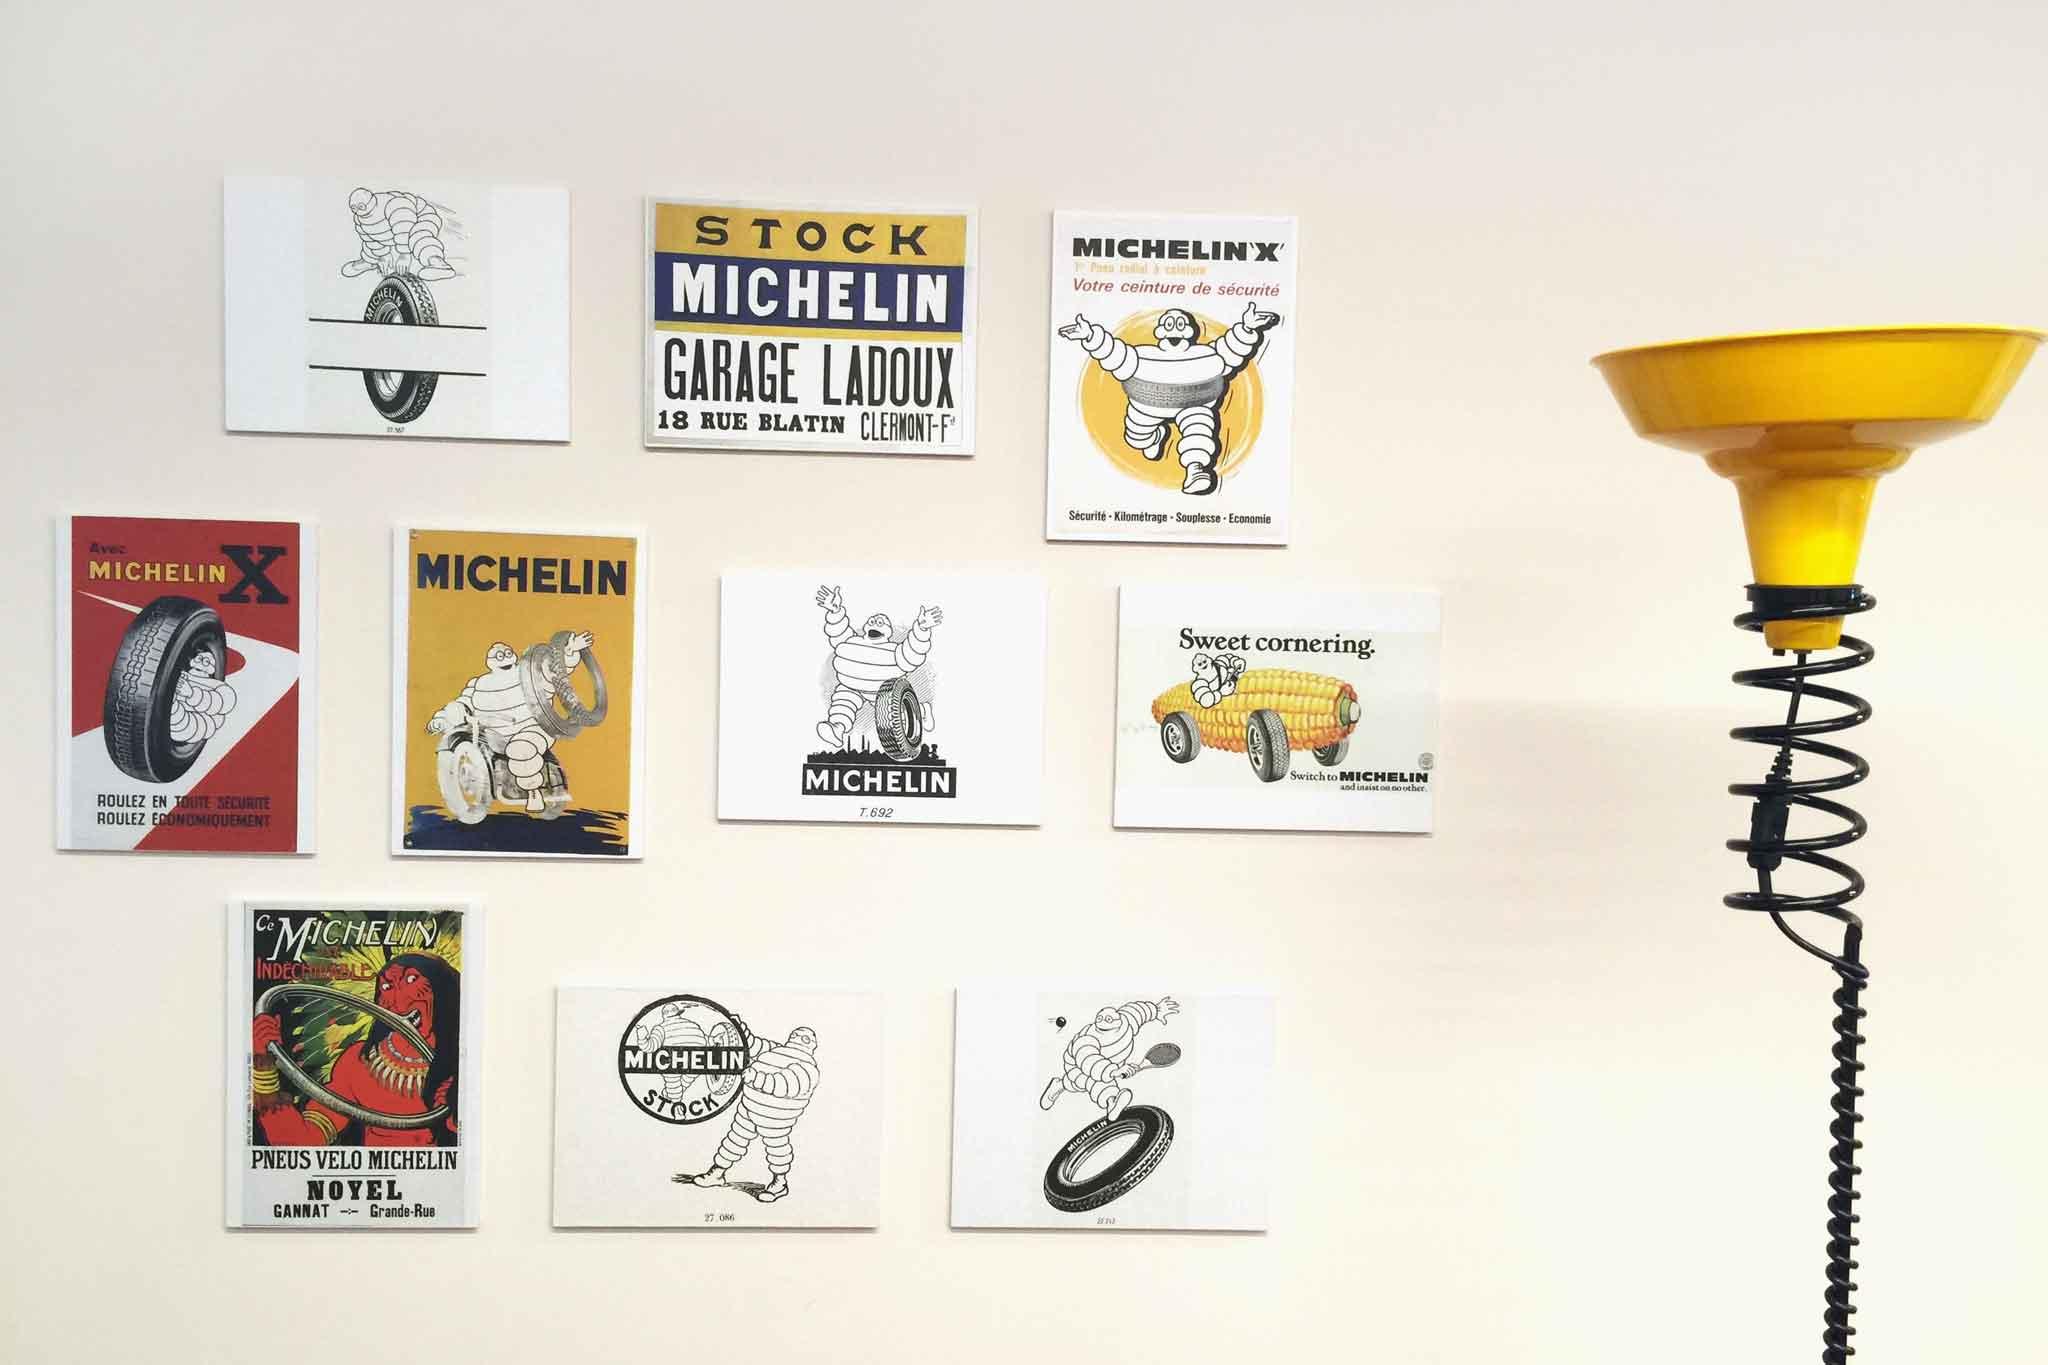 Michelin affiche